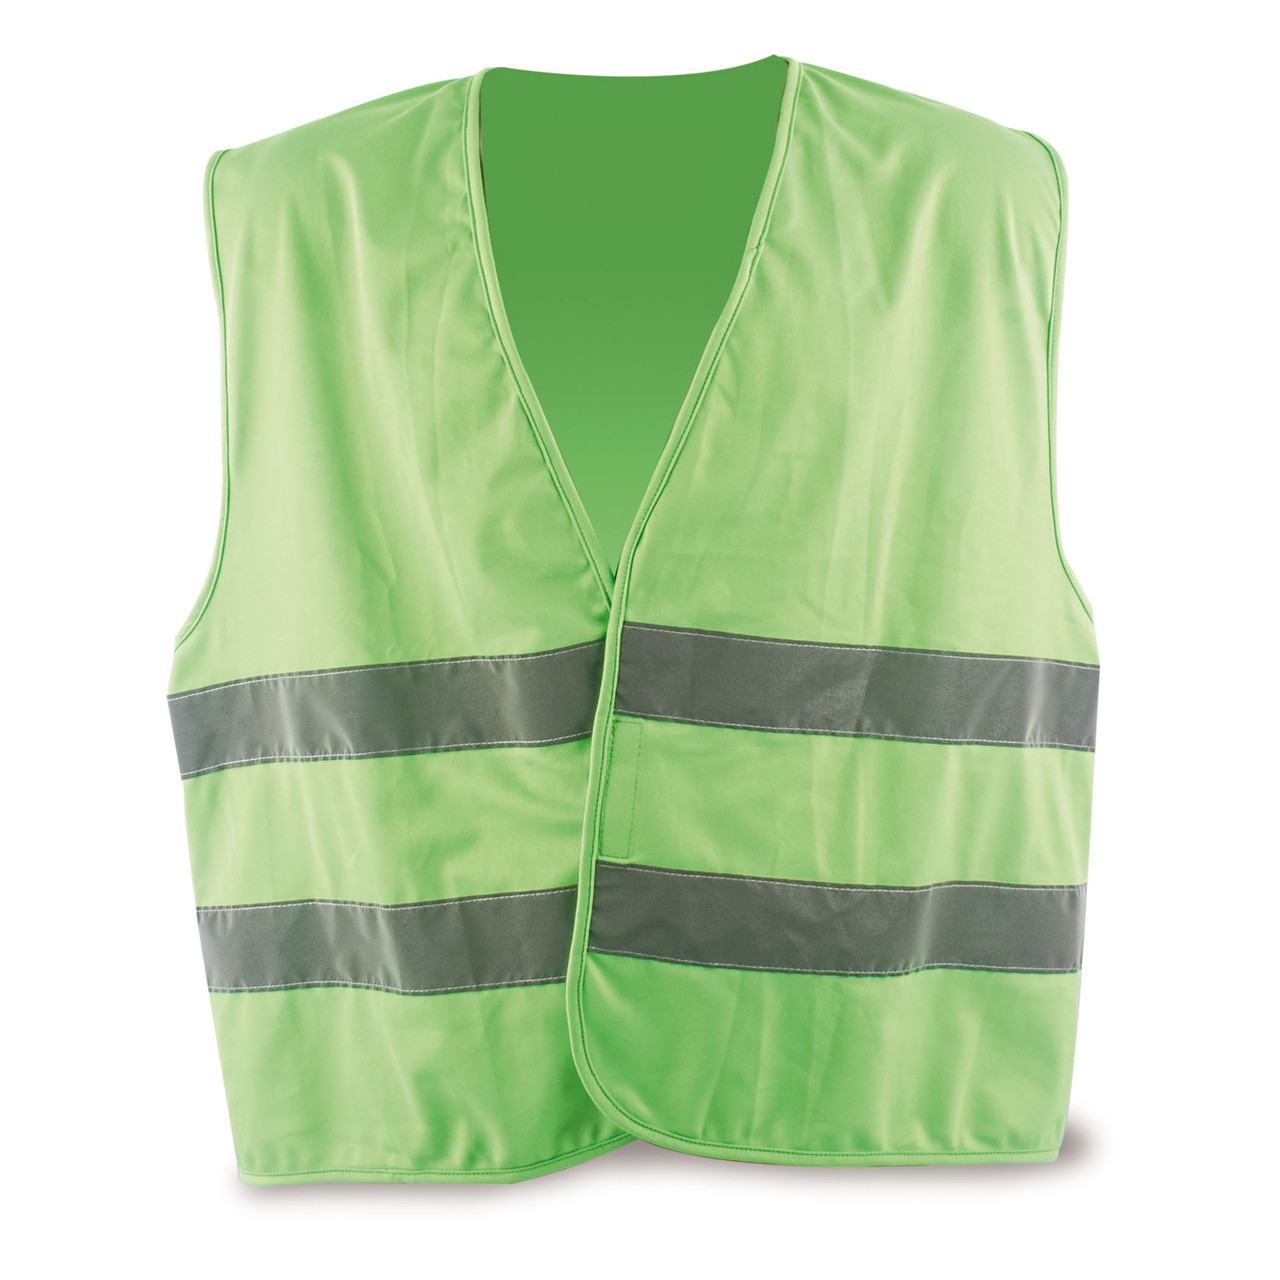 chaleco reflectante verde